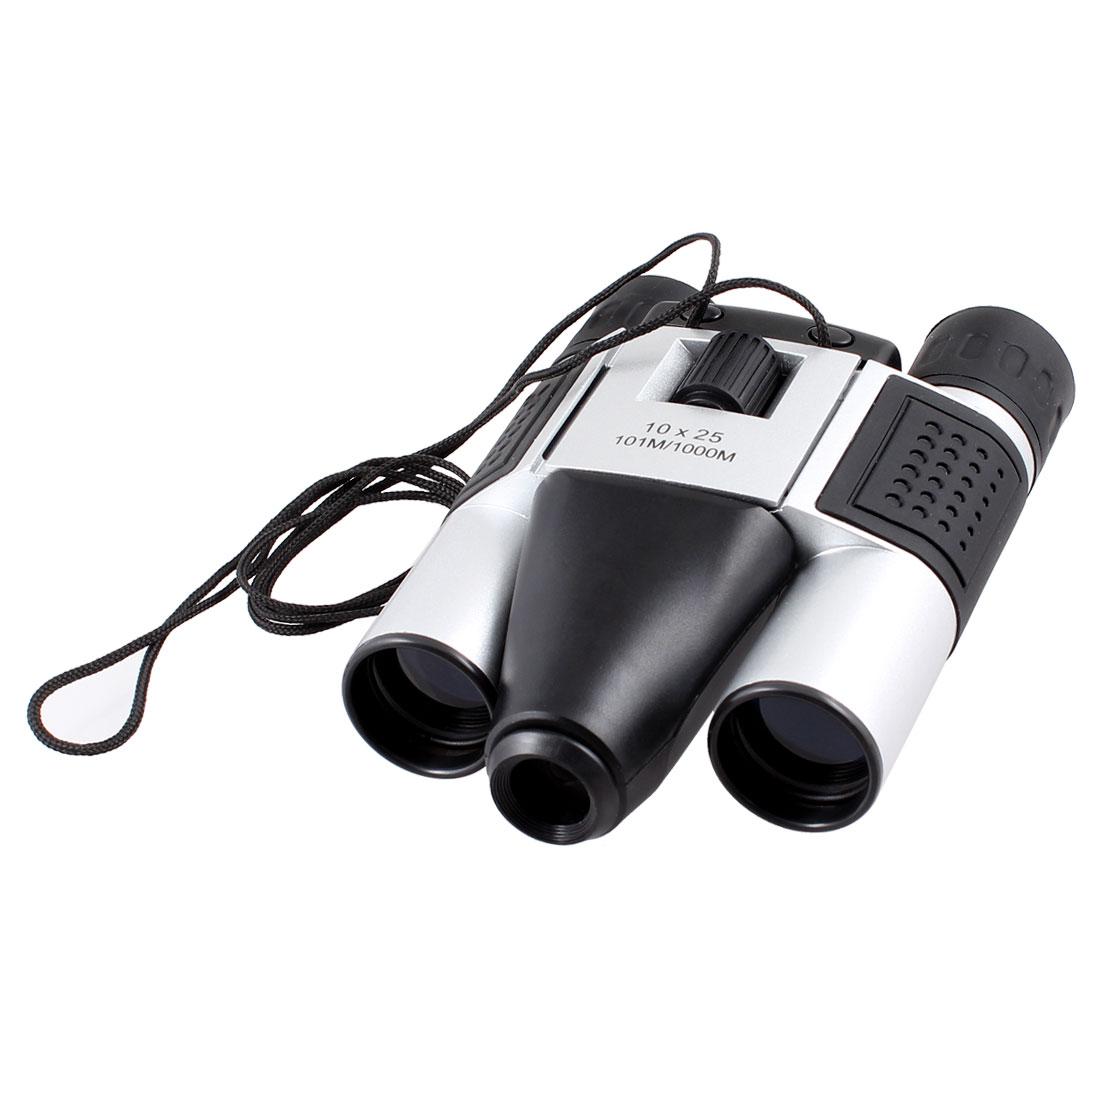 1. CMOS 10x25 Photos Video Recorder Digital Camera Binoculars DT08